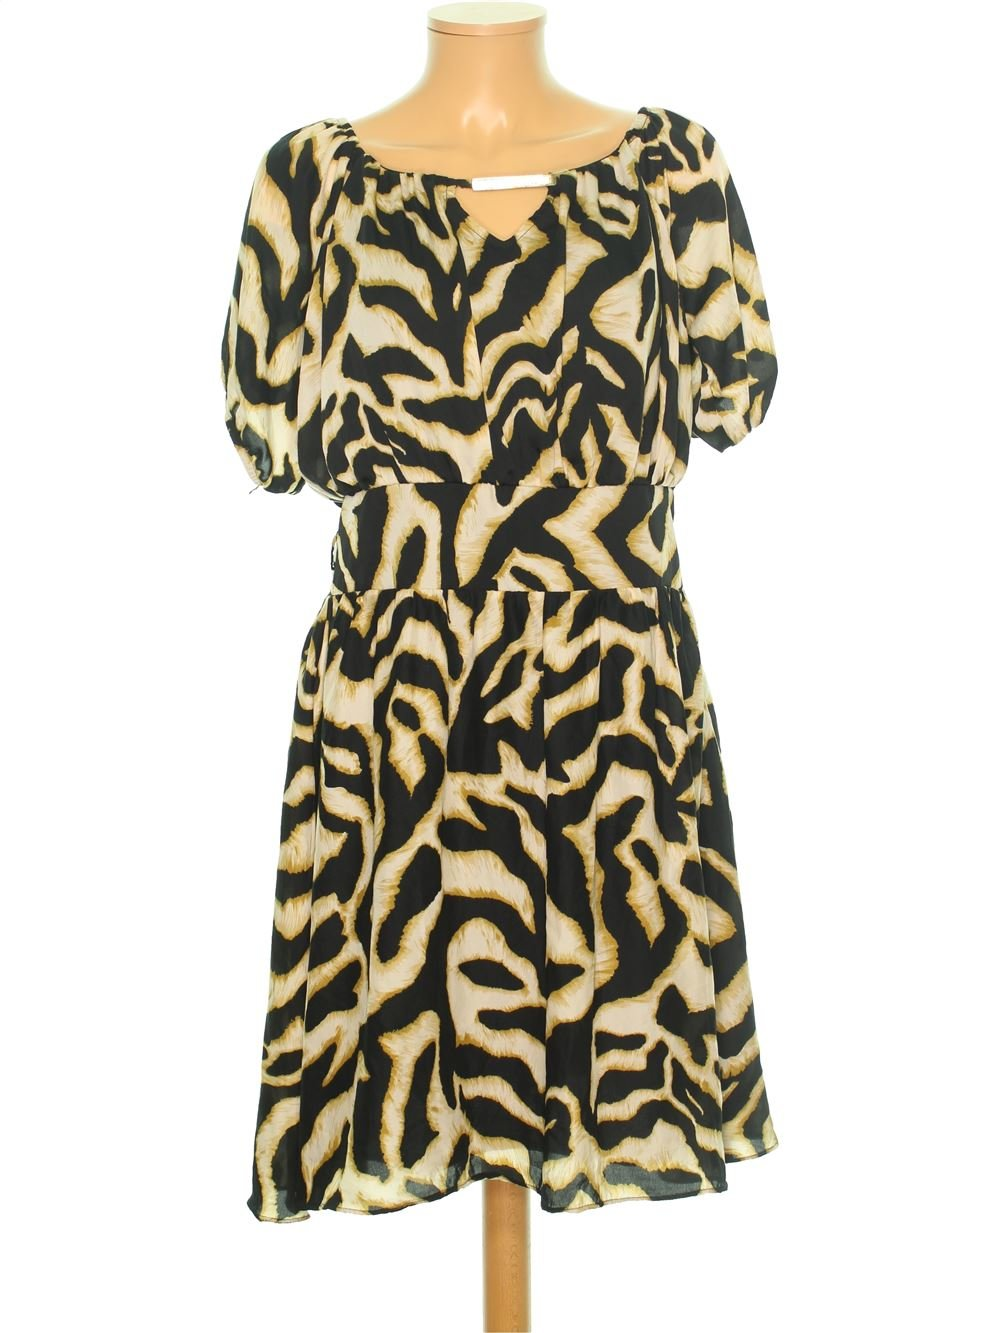 Robe Femme Cher7 Bodyform T2Pas 42l €1701187 99 kZuiXP